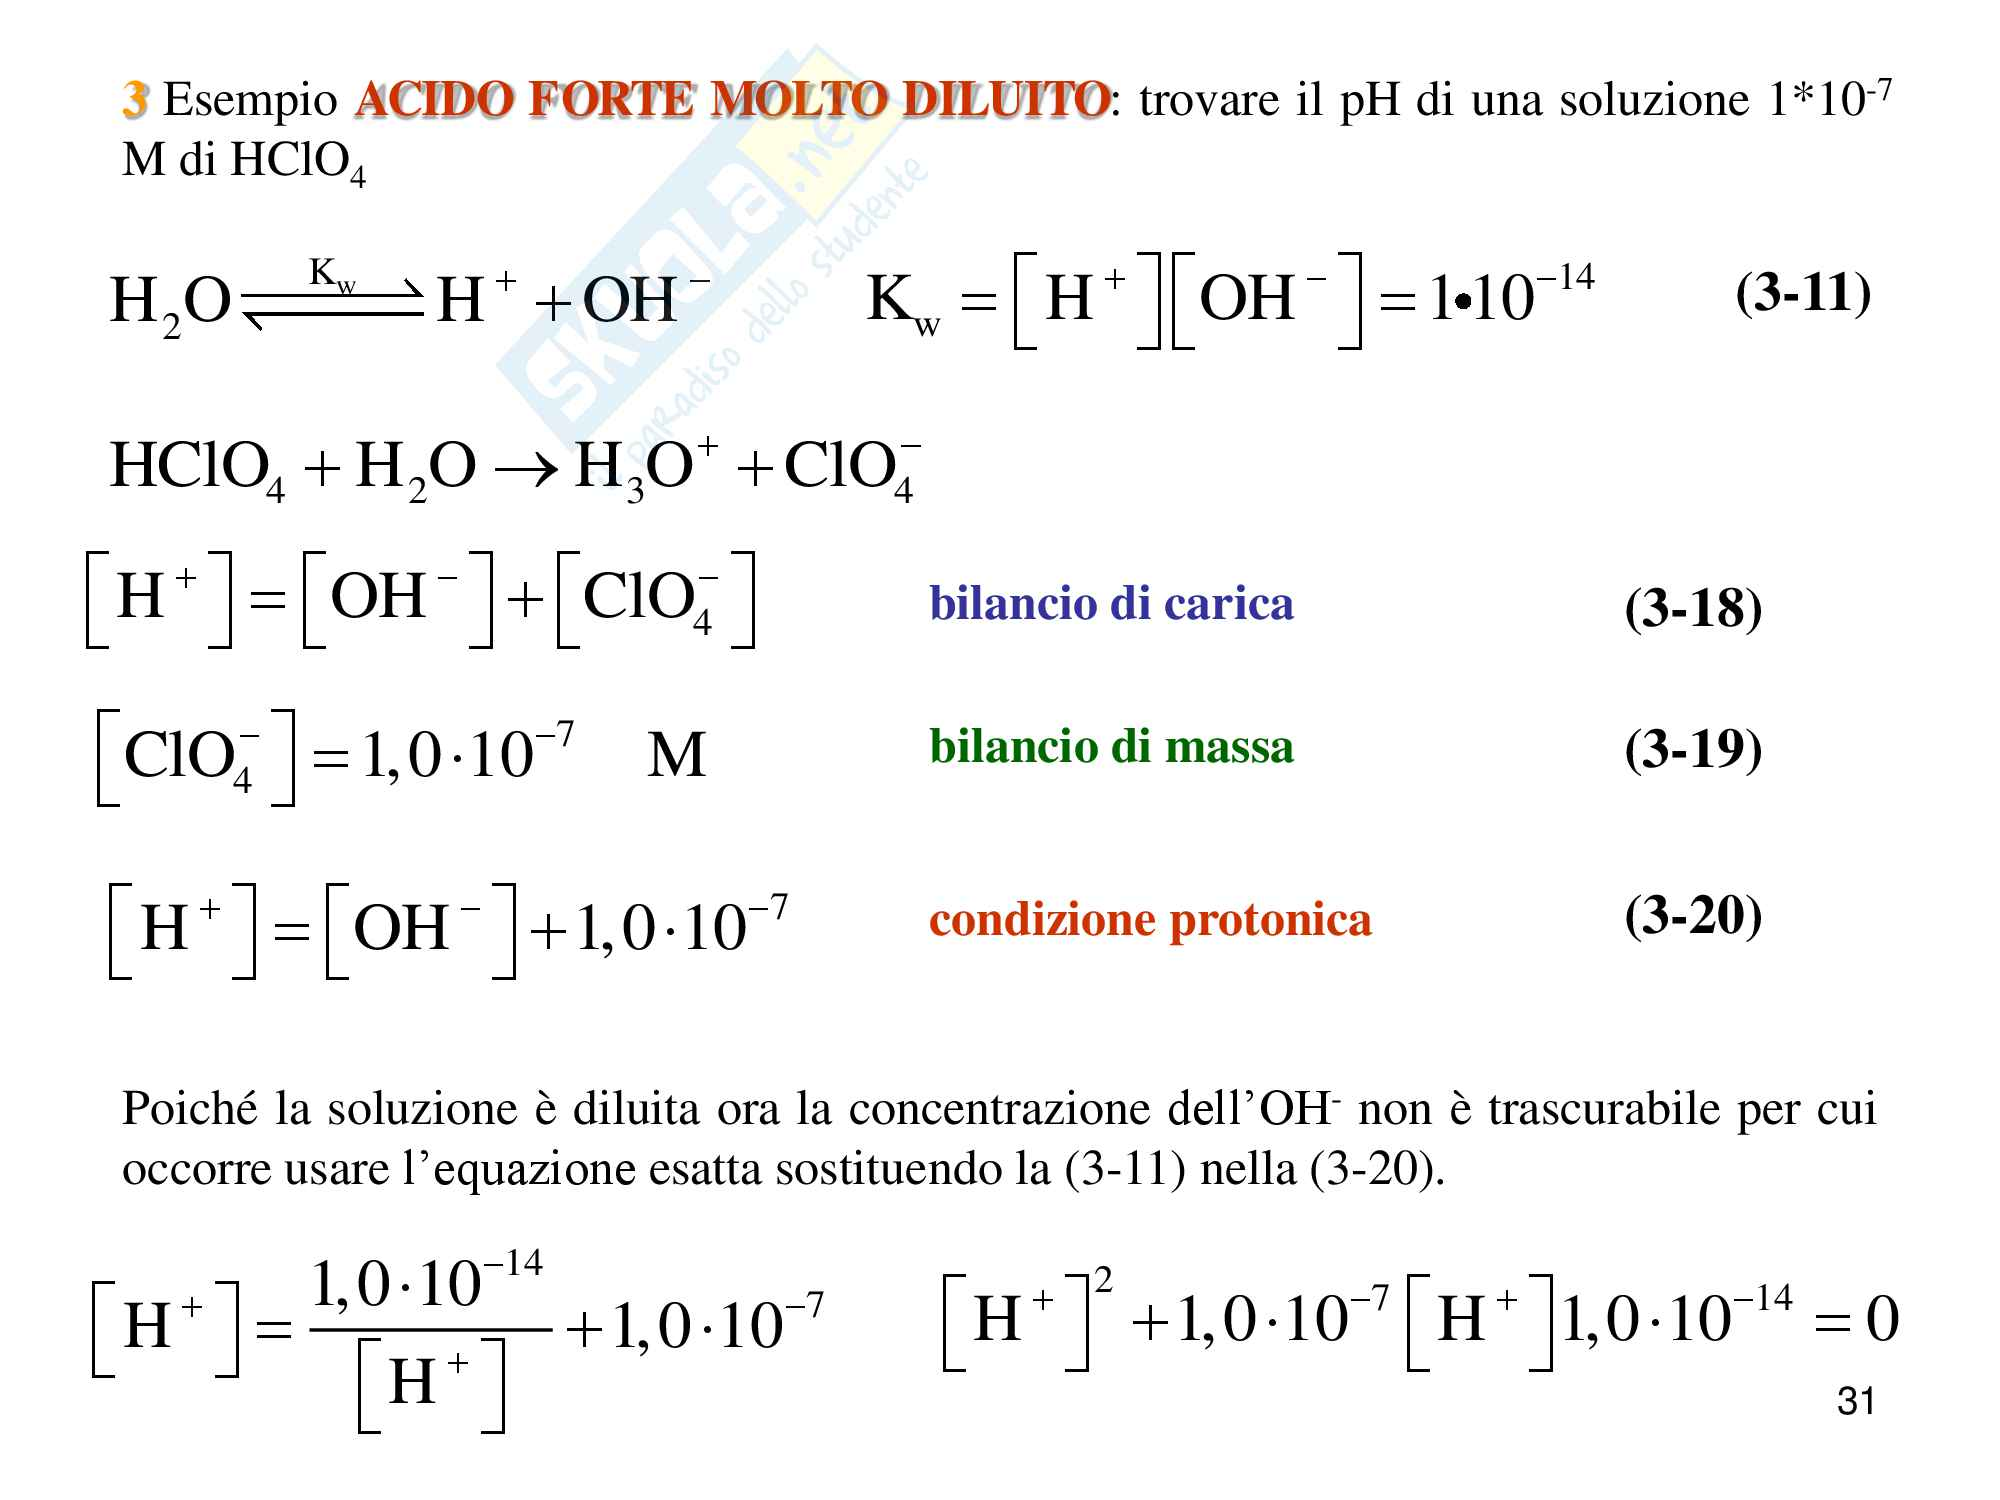 Chimica analitica, equilibrio acido base Pag. 31